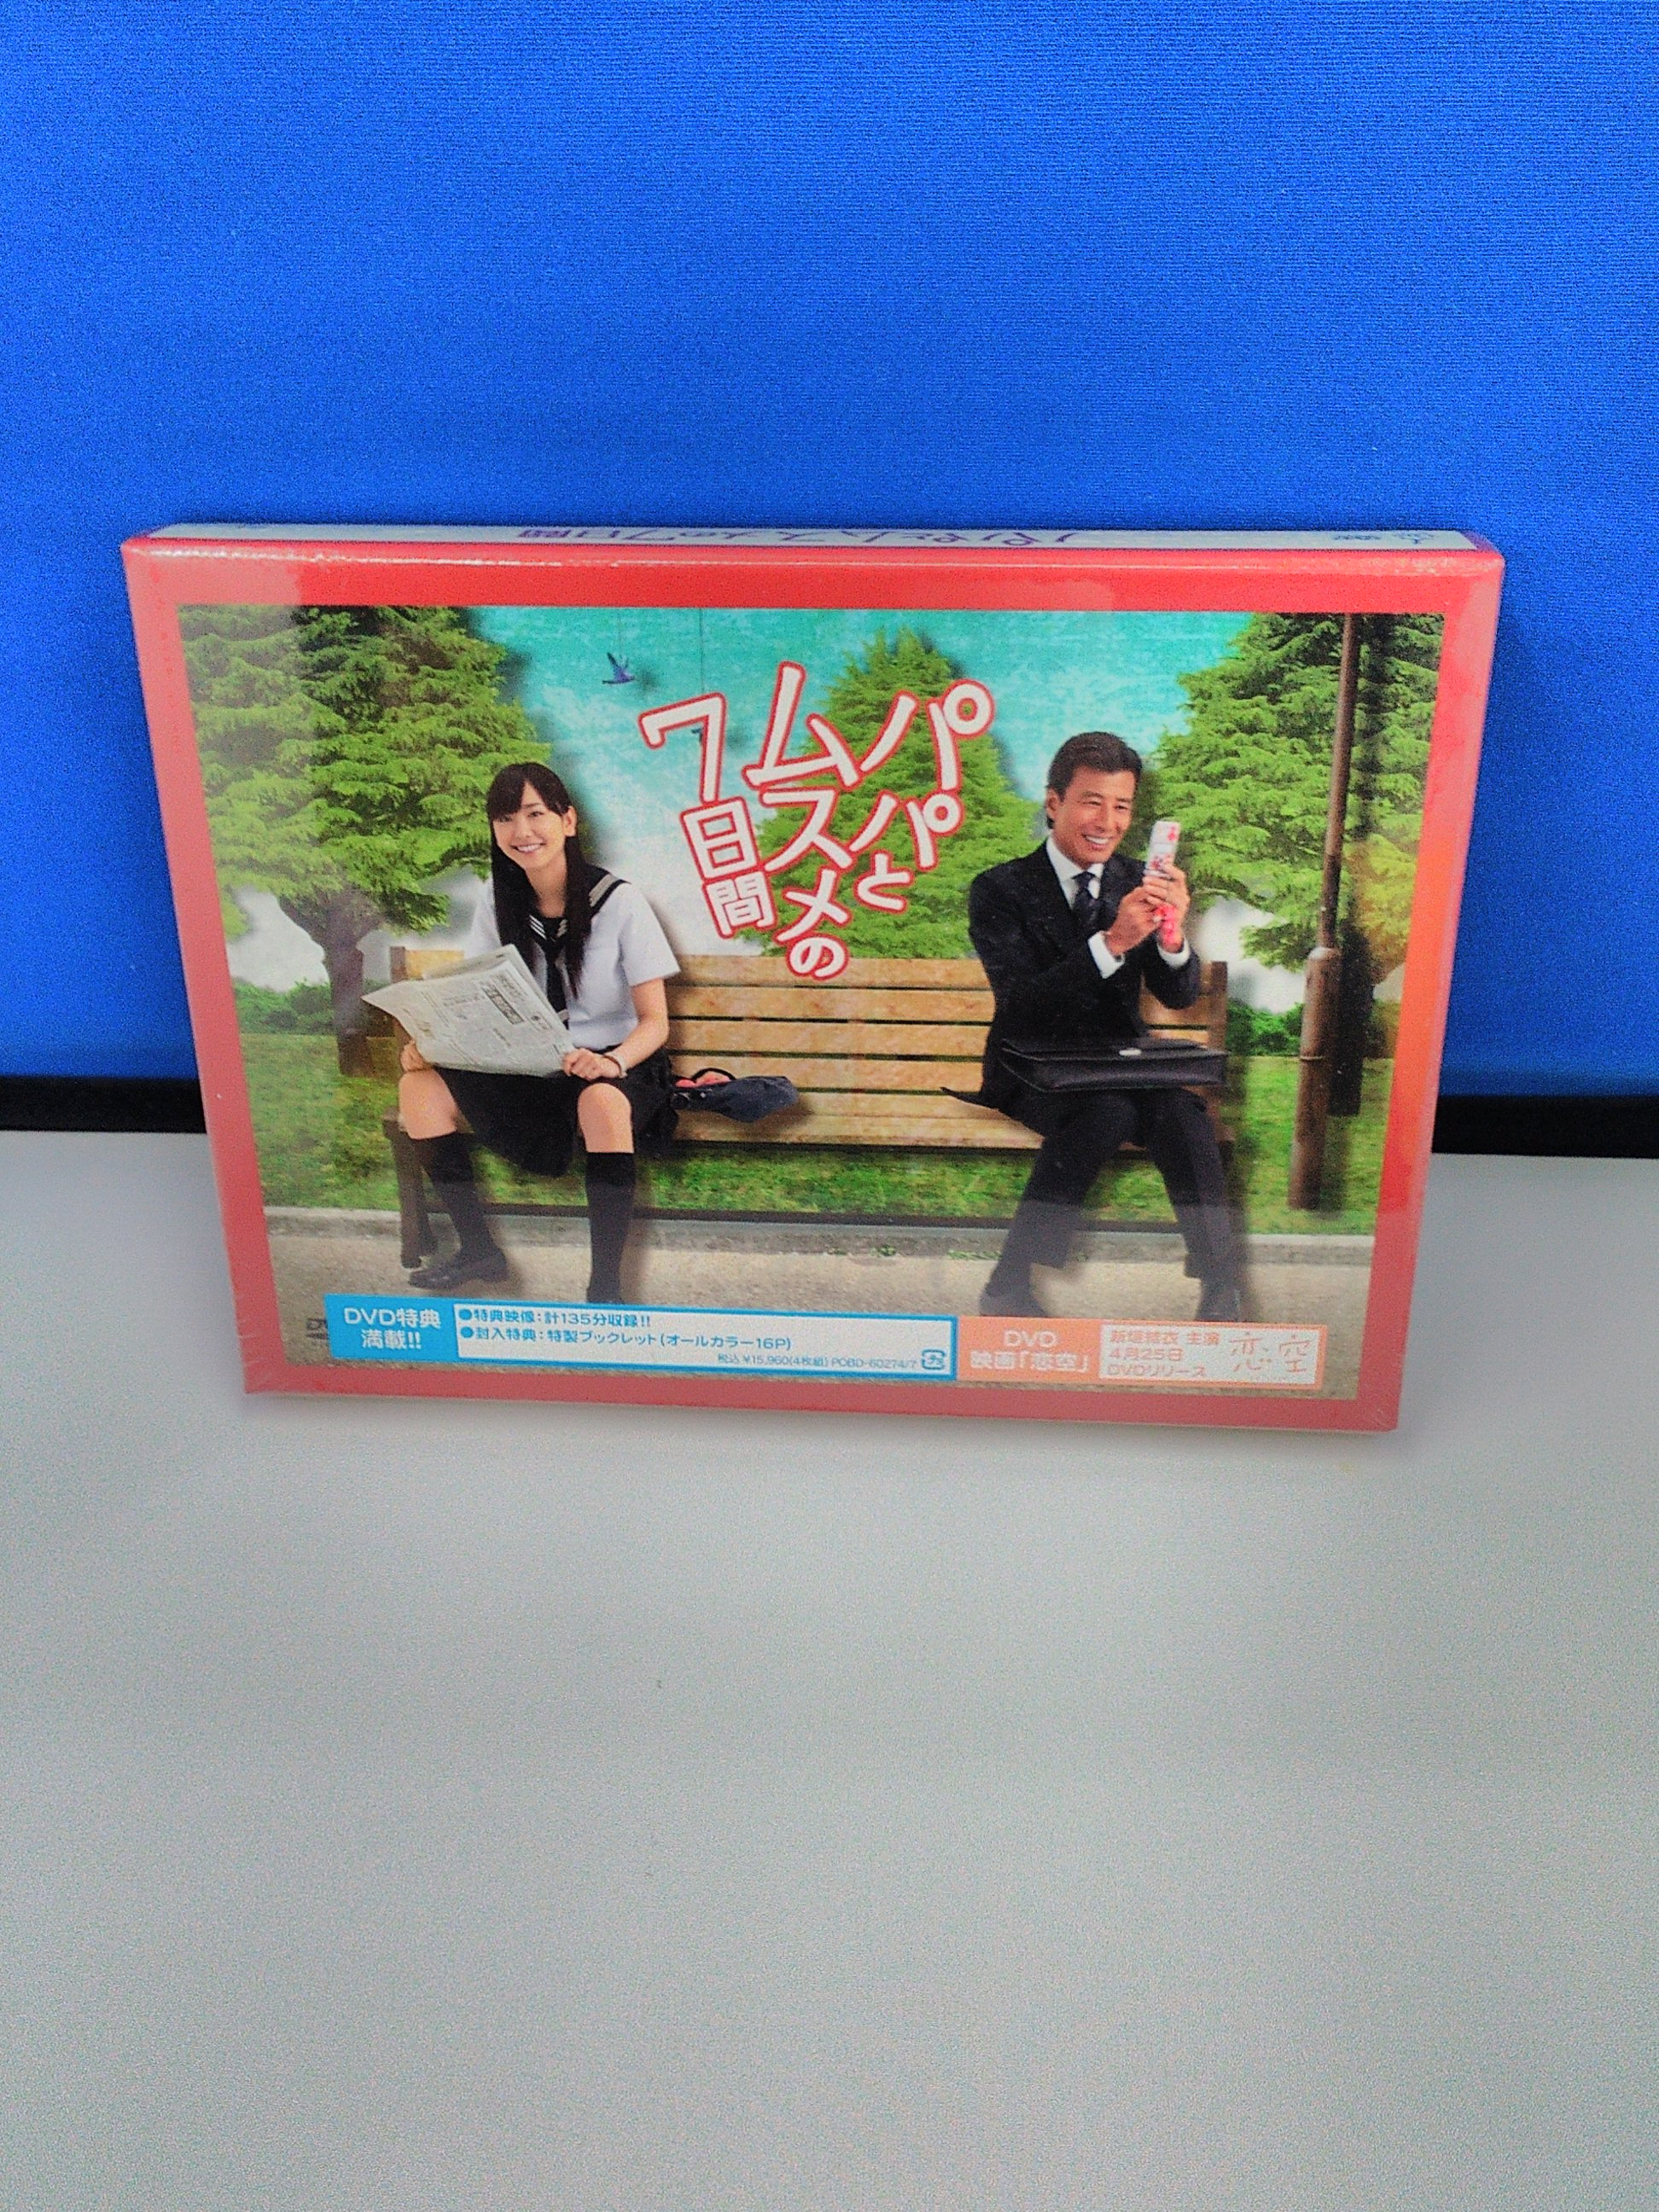 DVD-BOX パパと娘の7日間 TBS